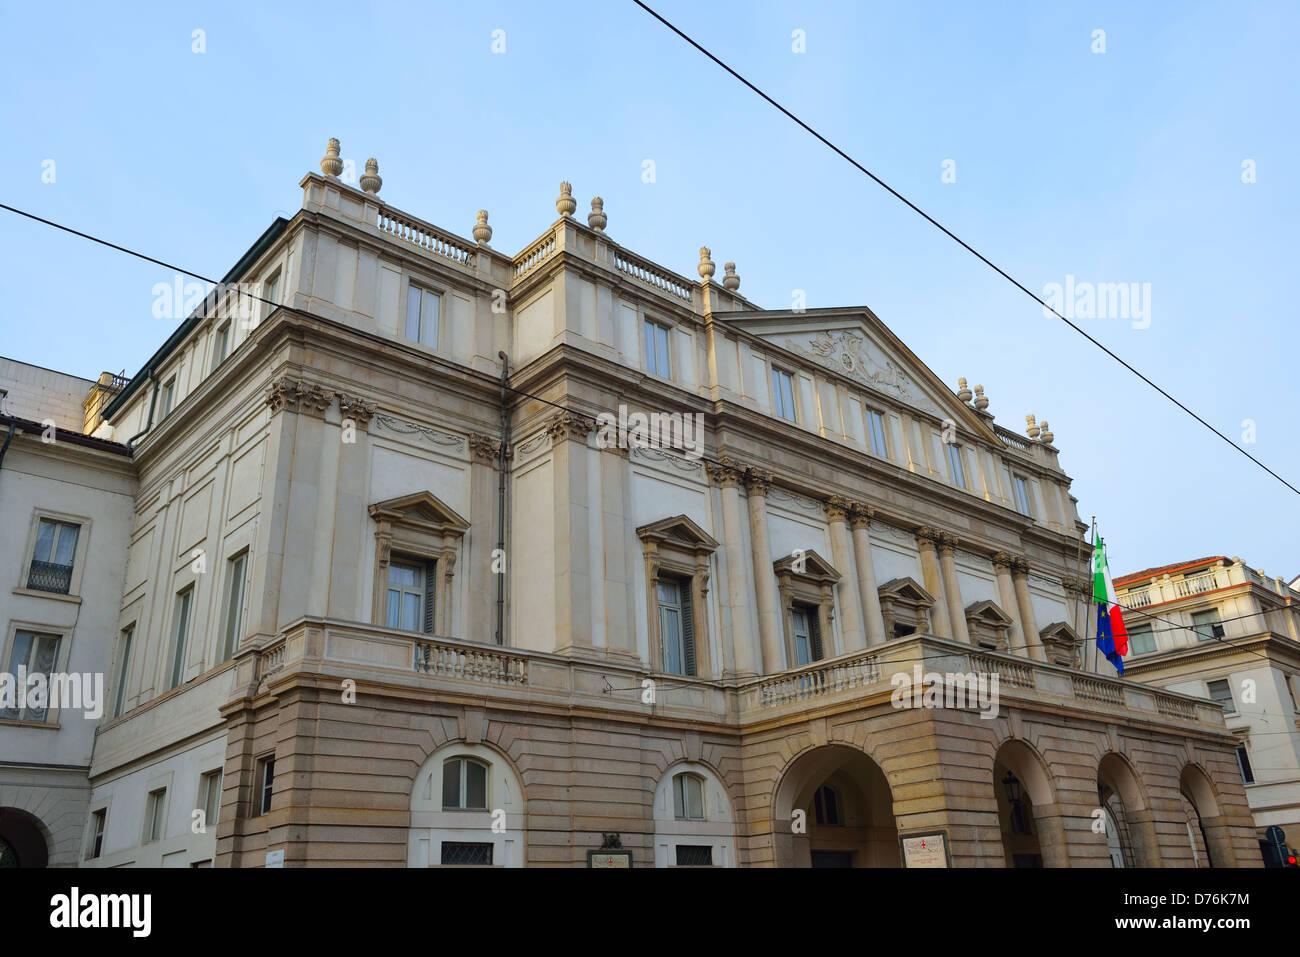 La Scala (Italian: Teatro alla Scala), a world-renowned opera house in Milan, Italy. - Stock Image